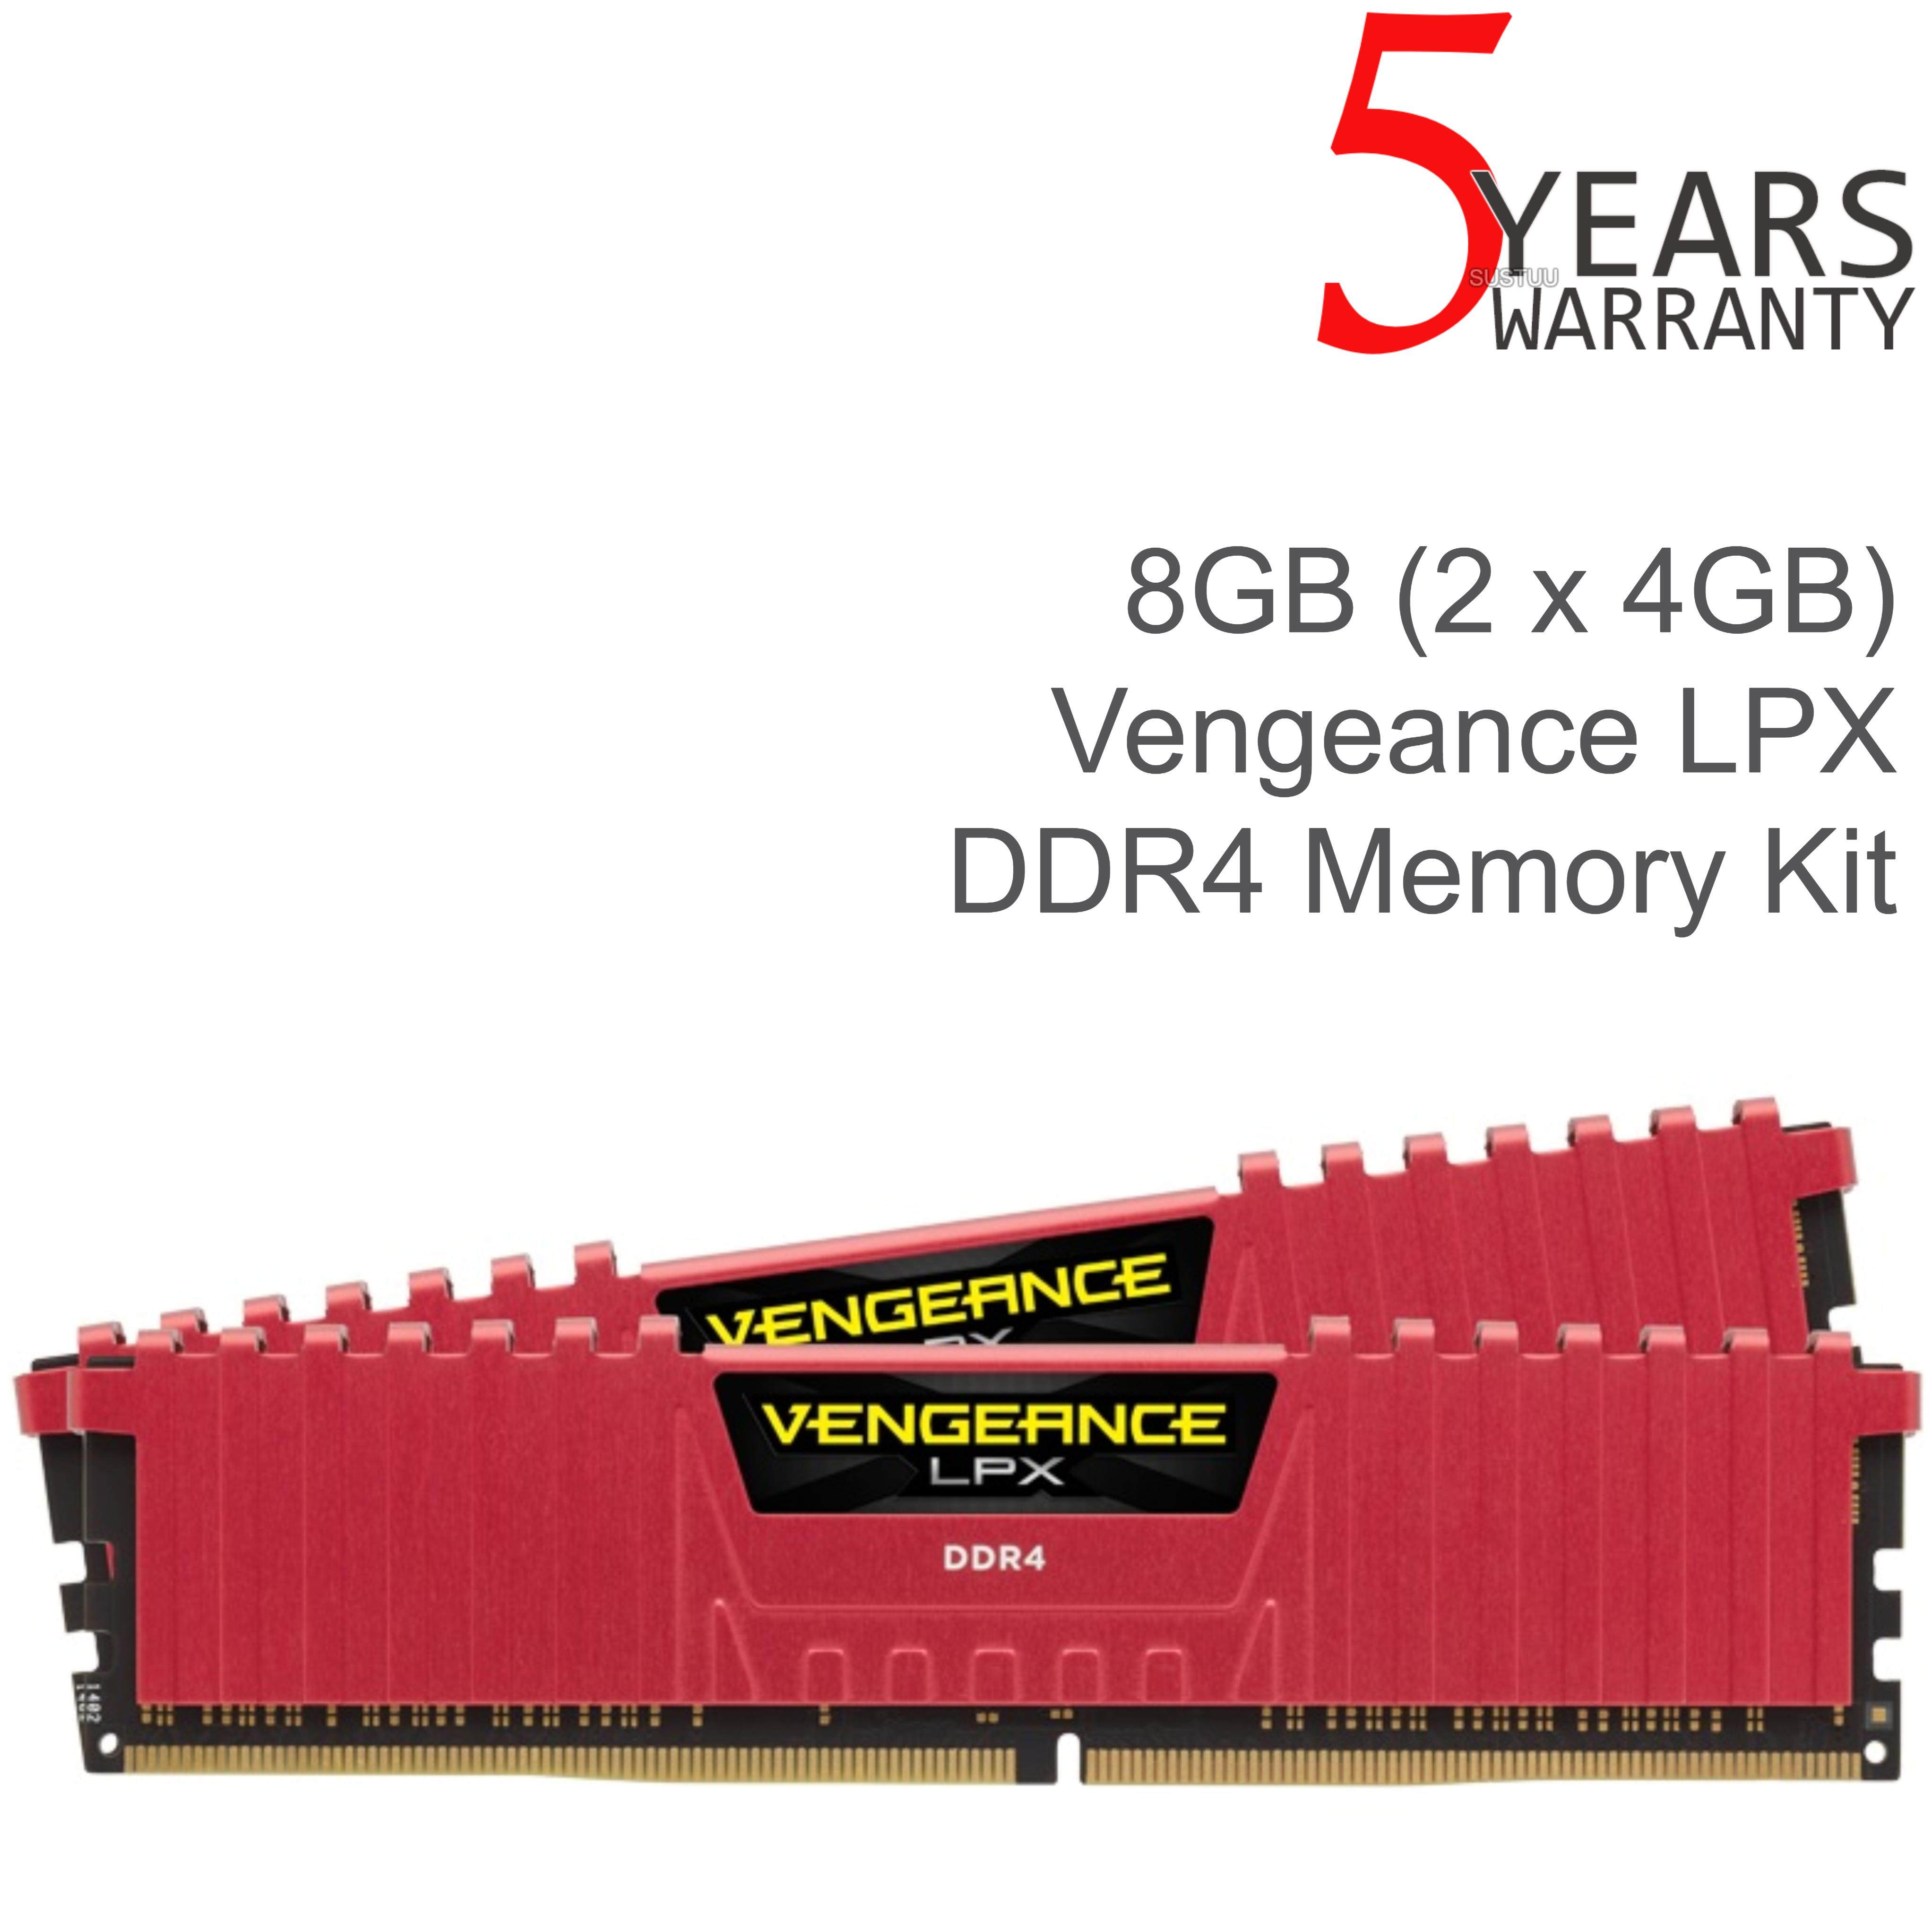 Corsair 8GB (2 x 4GB) Vengeance LPX DDR4 XMP 2.0 Desktop Memory Kit | 2400 MHz | Red